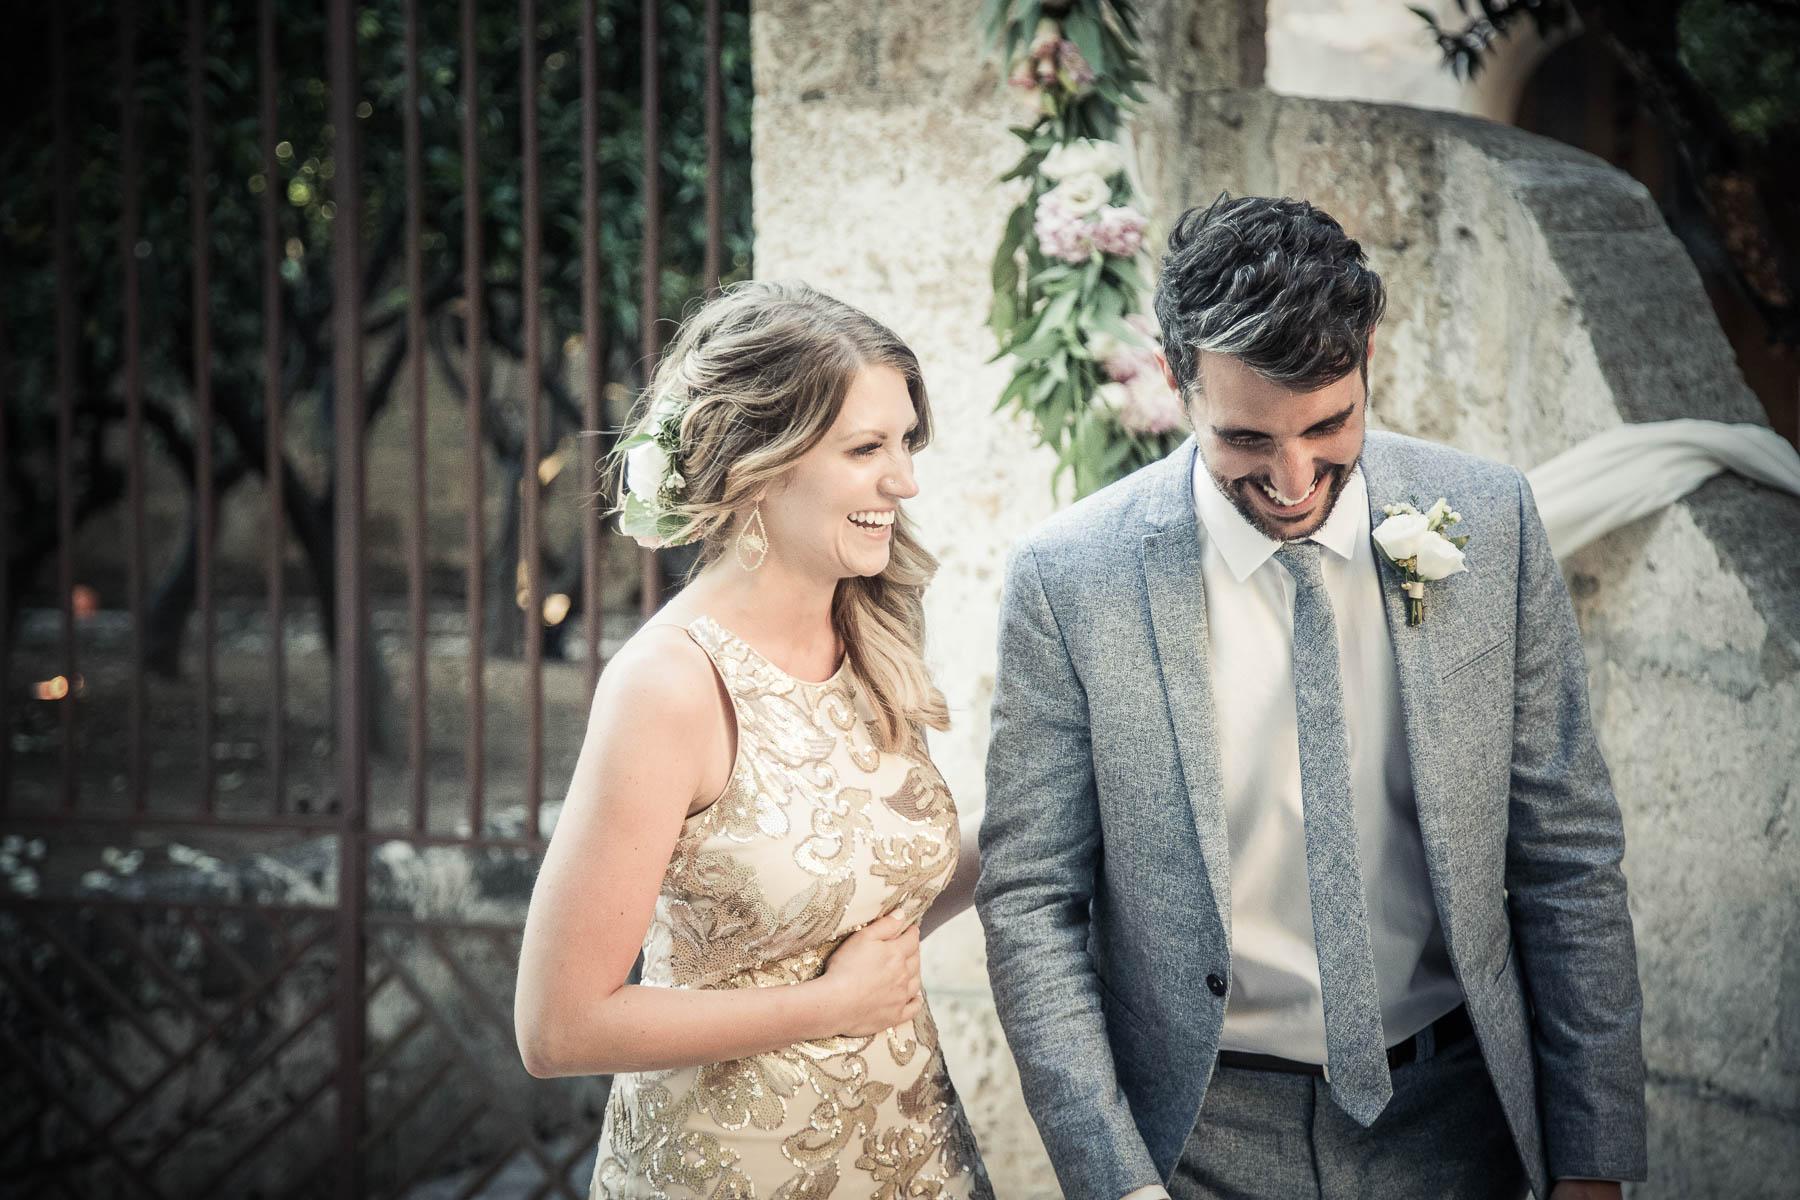 wedding palazzo daniele apulia 19.jpg